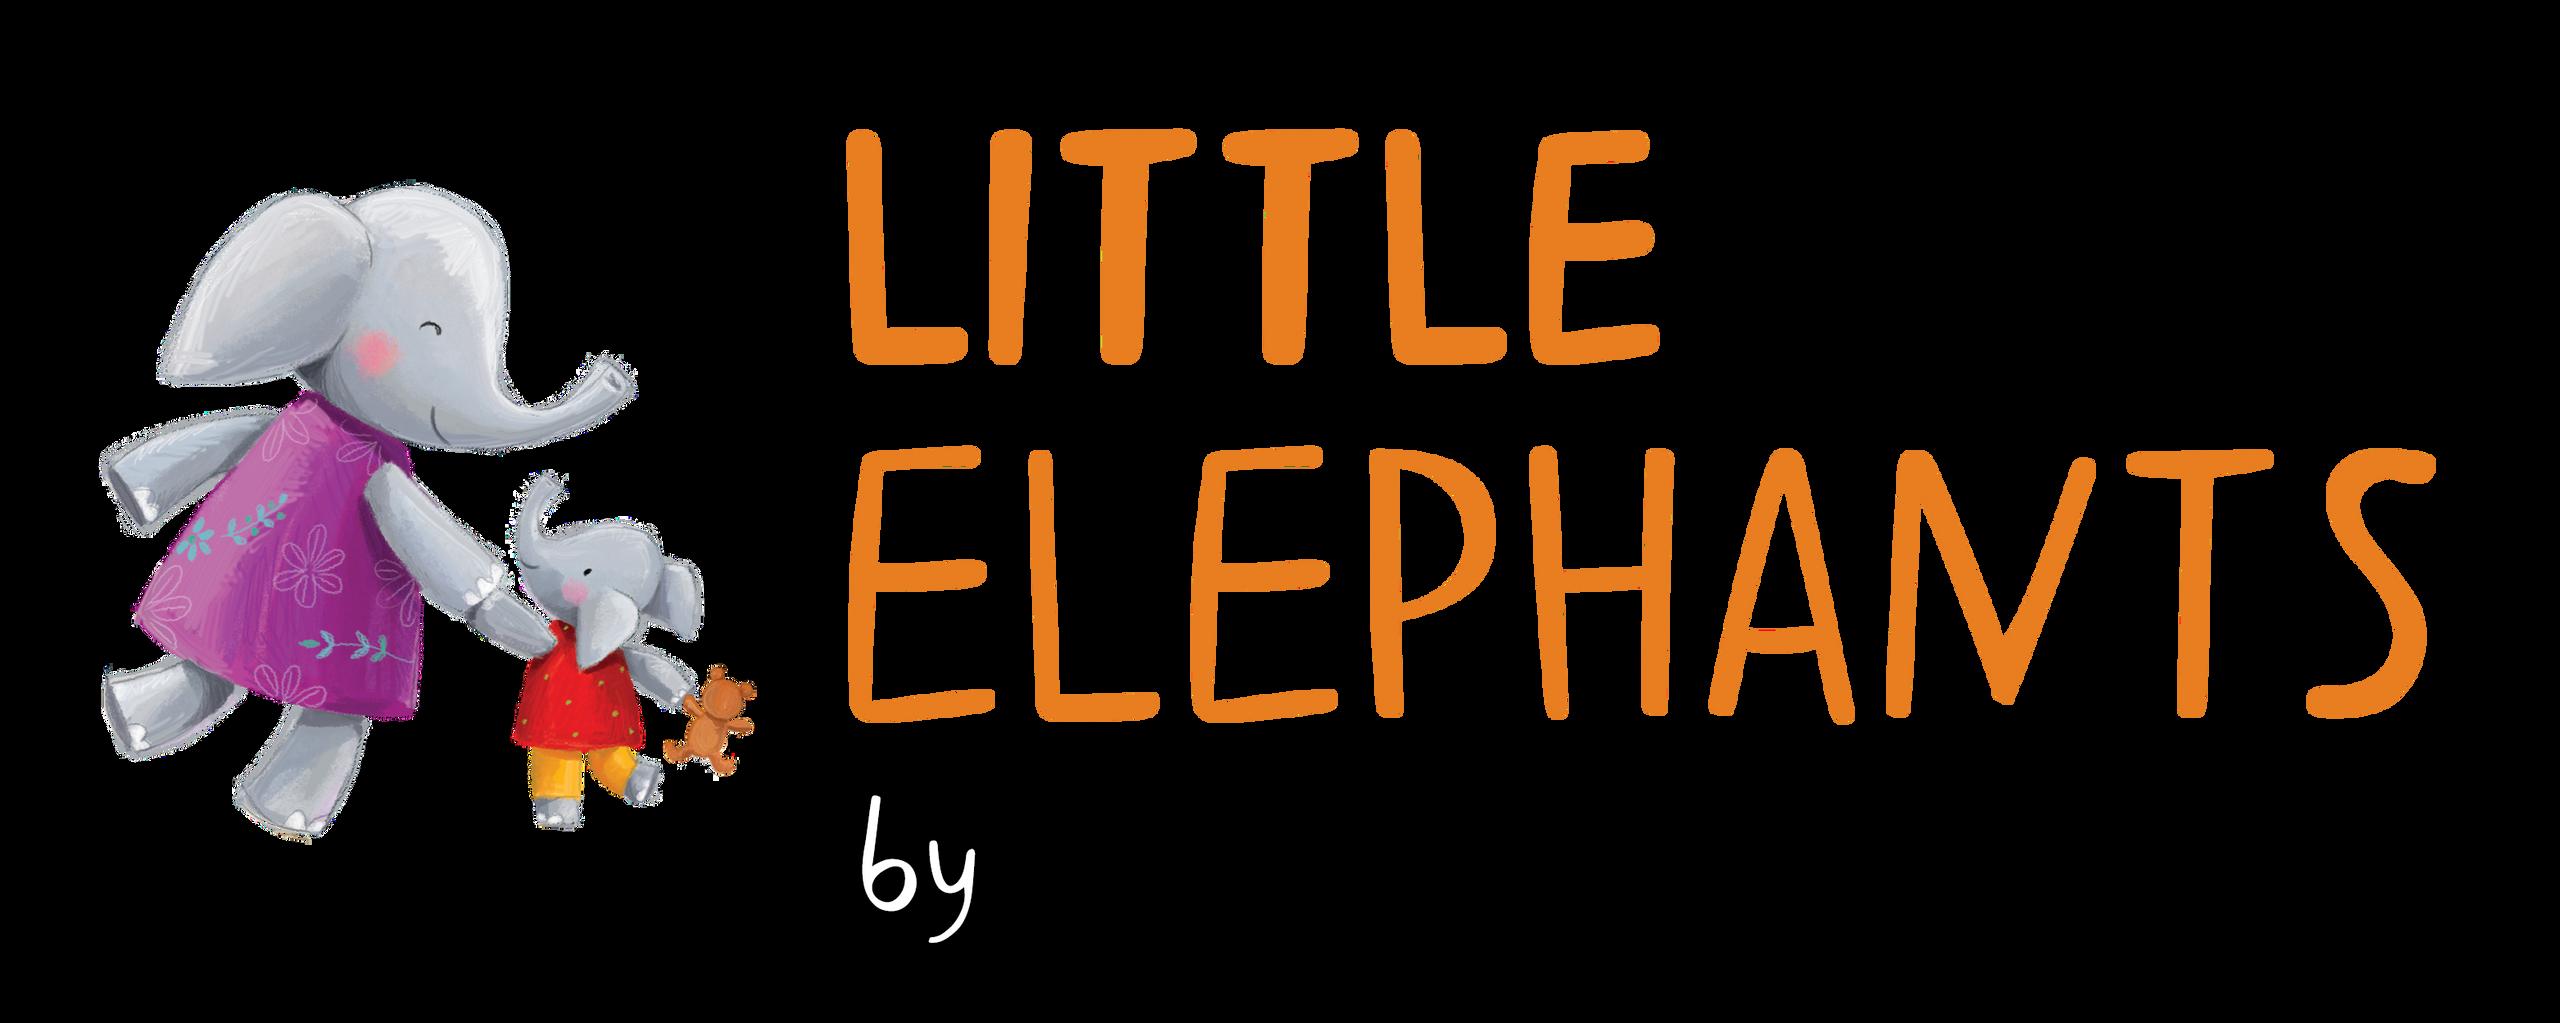 Little Elephants logo